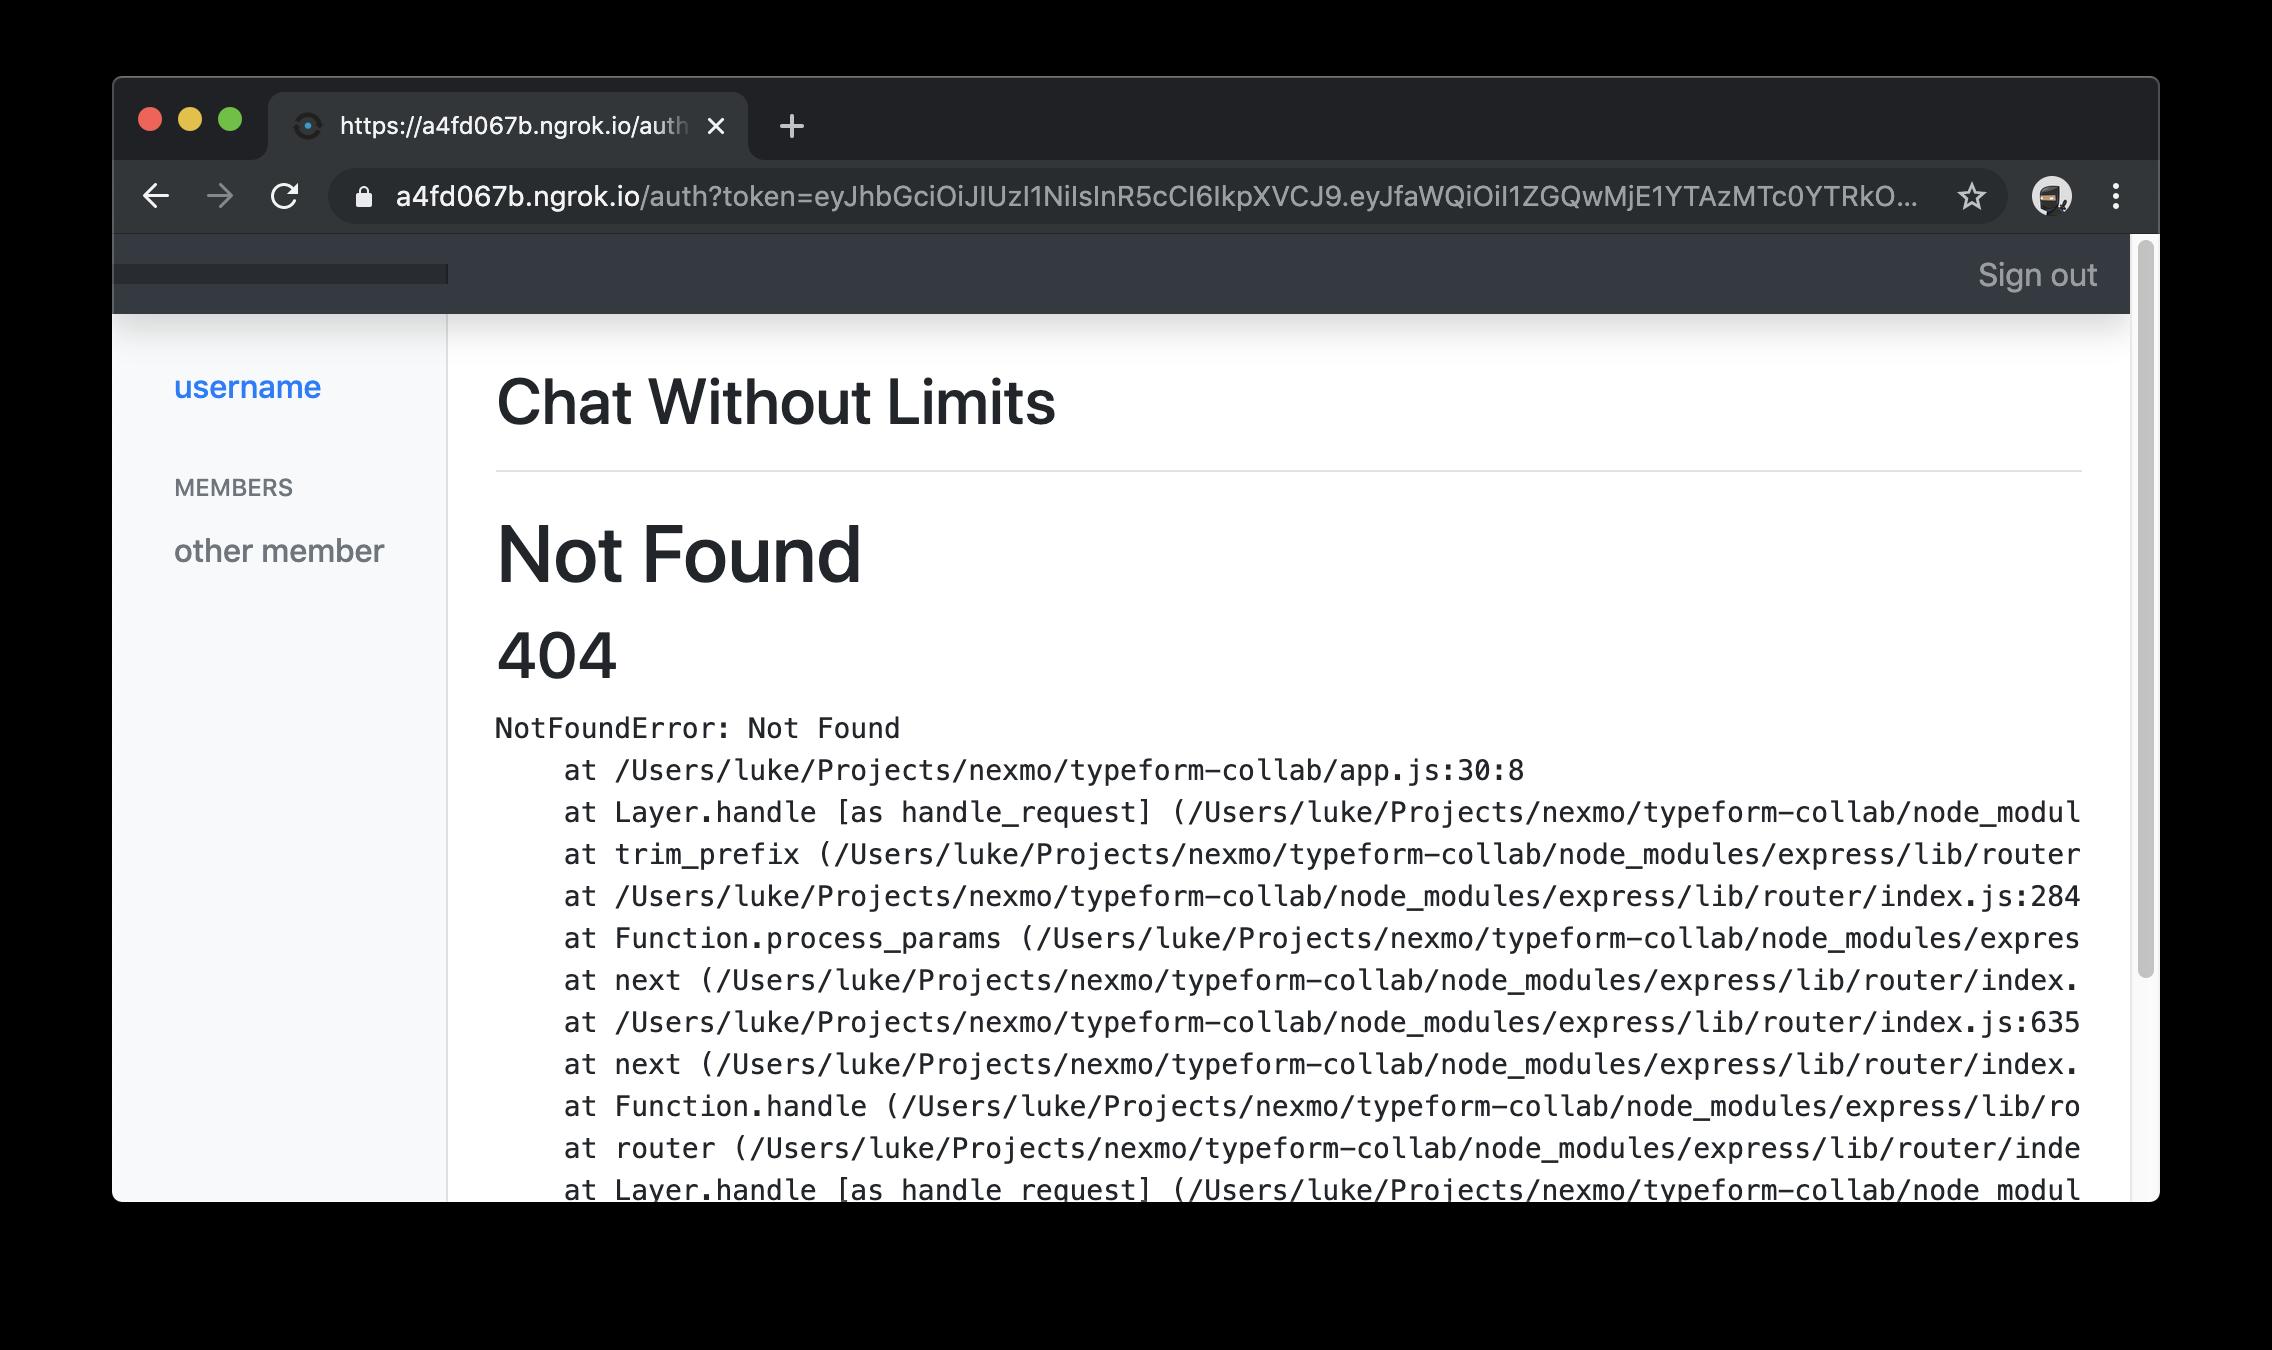 Magic link 404s